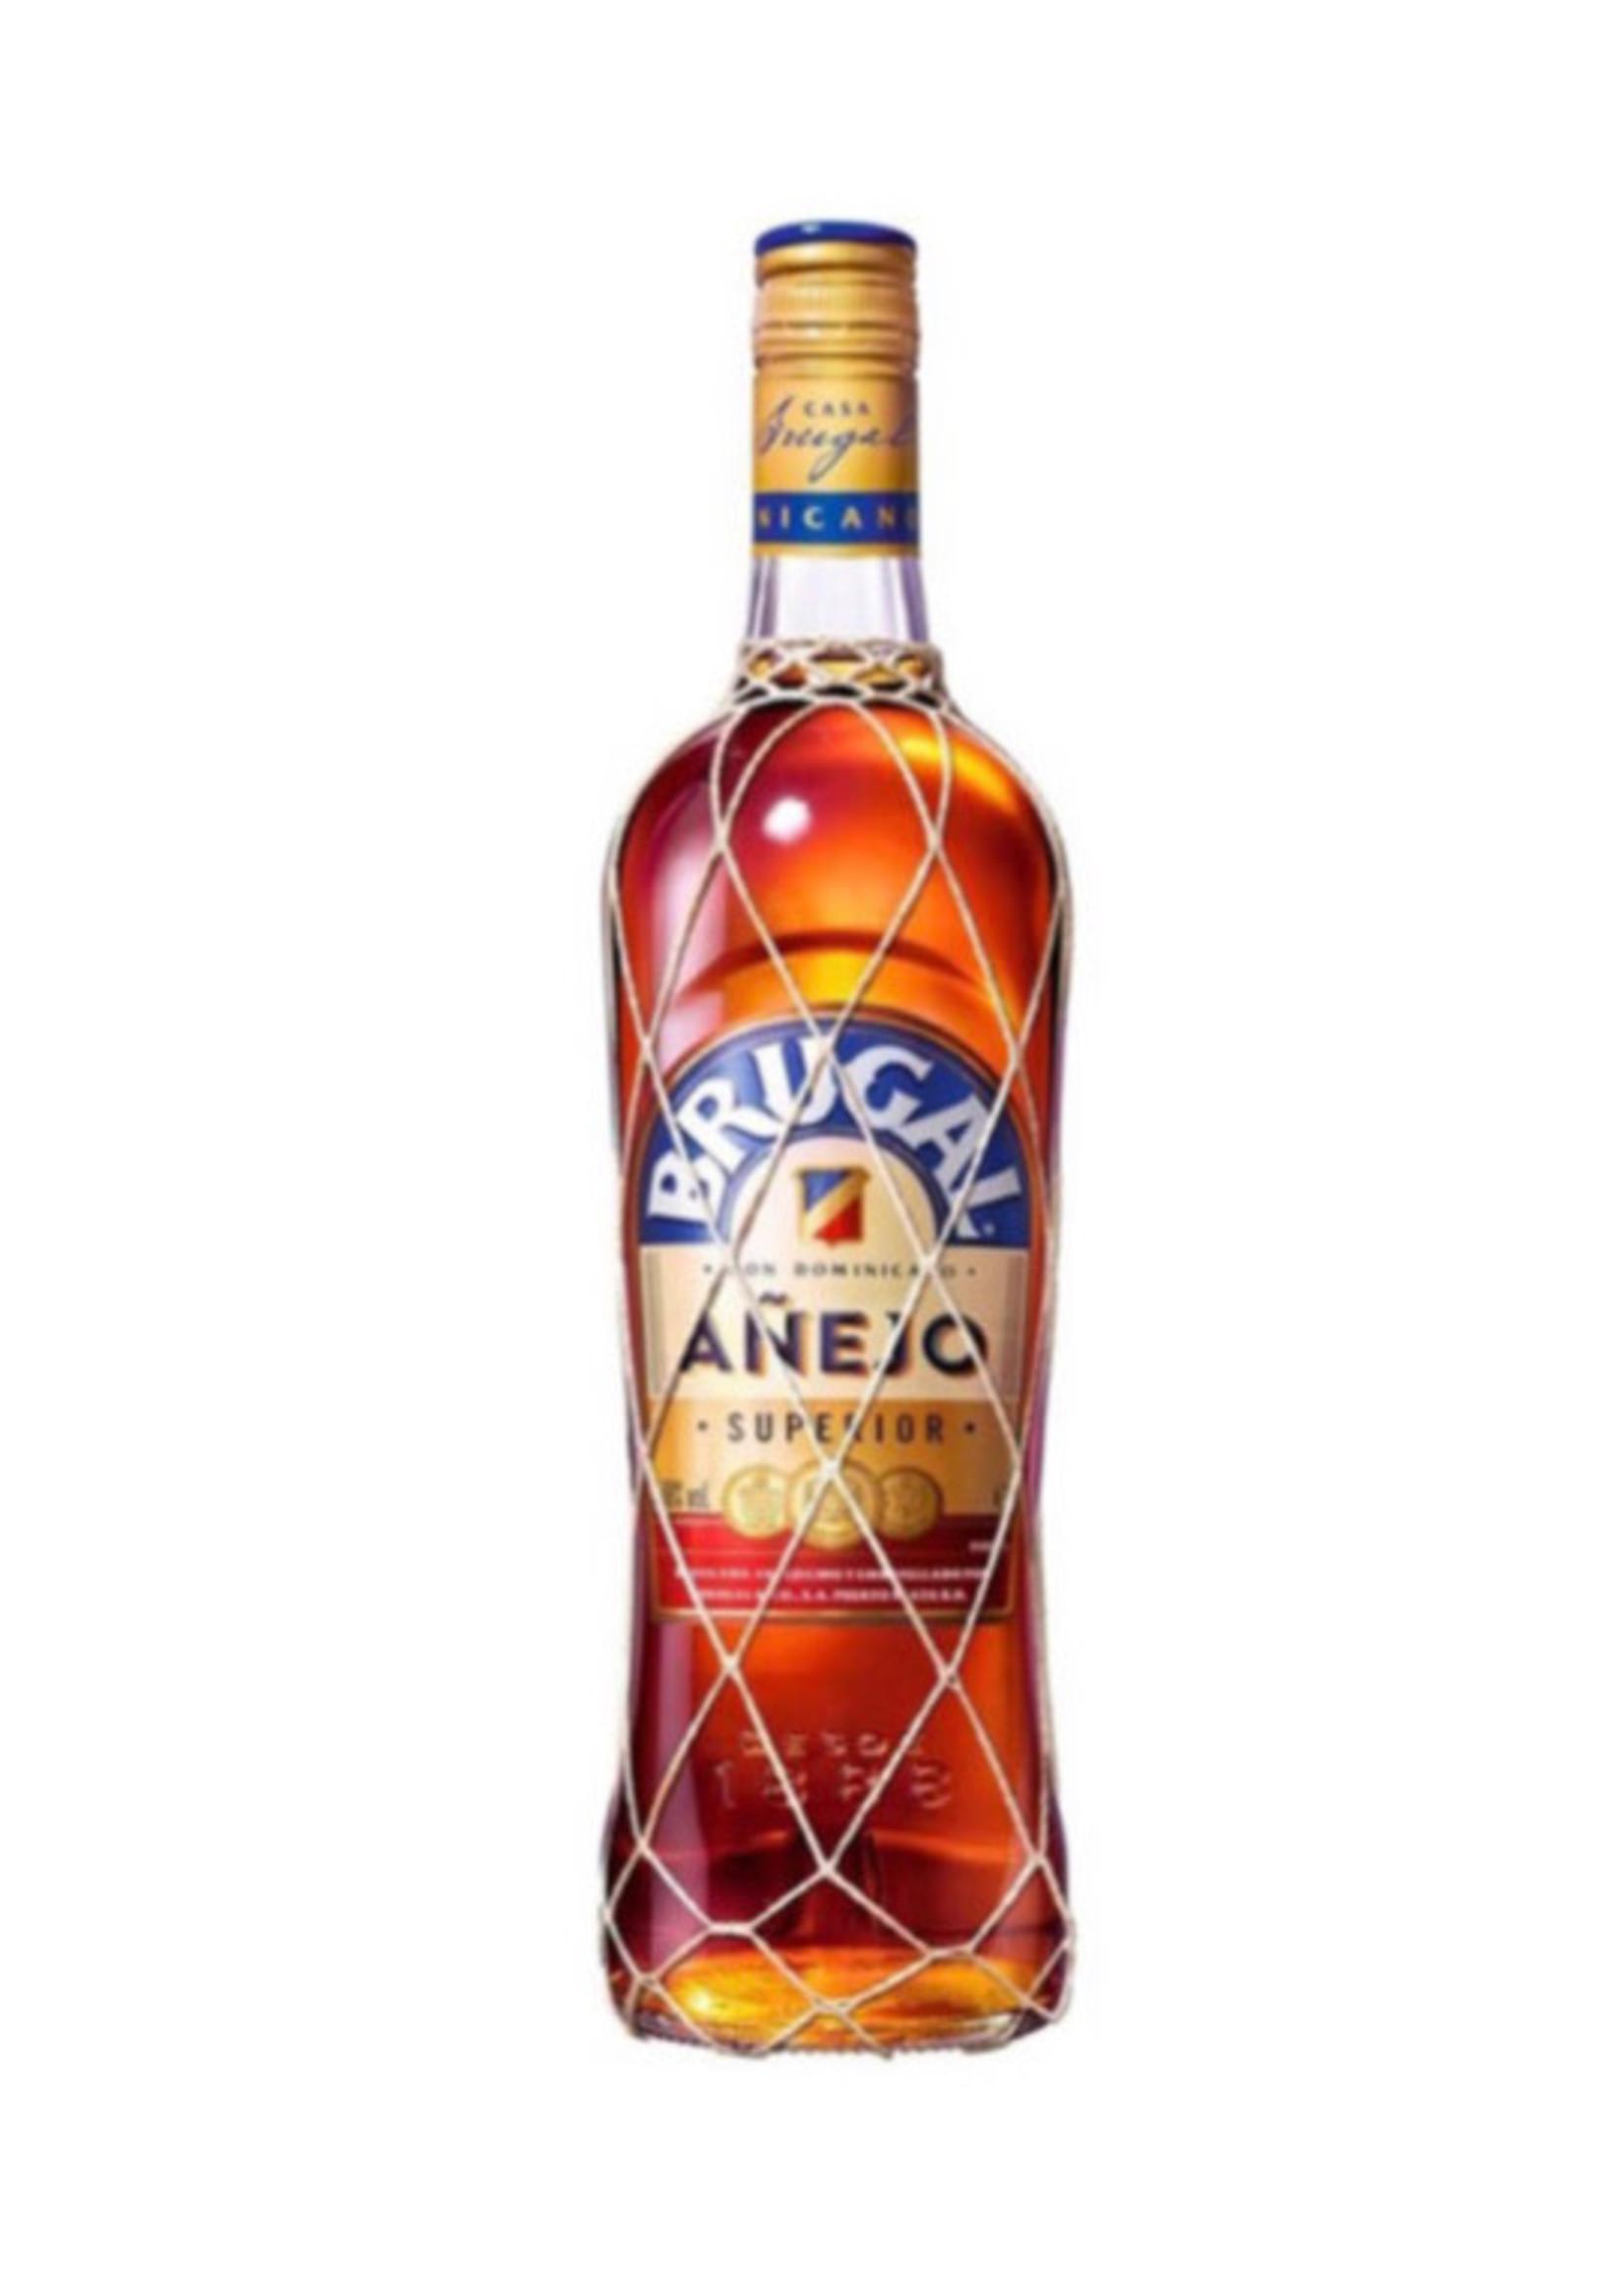 Brugal Anejo Rum 750mL